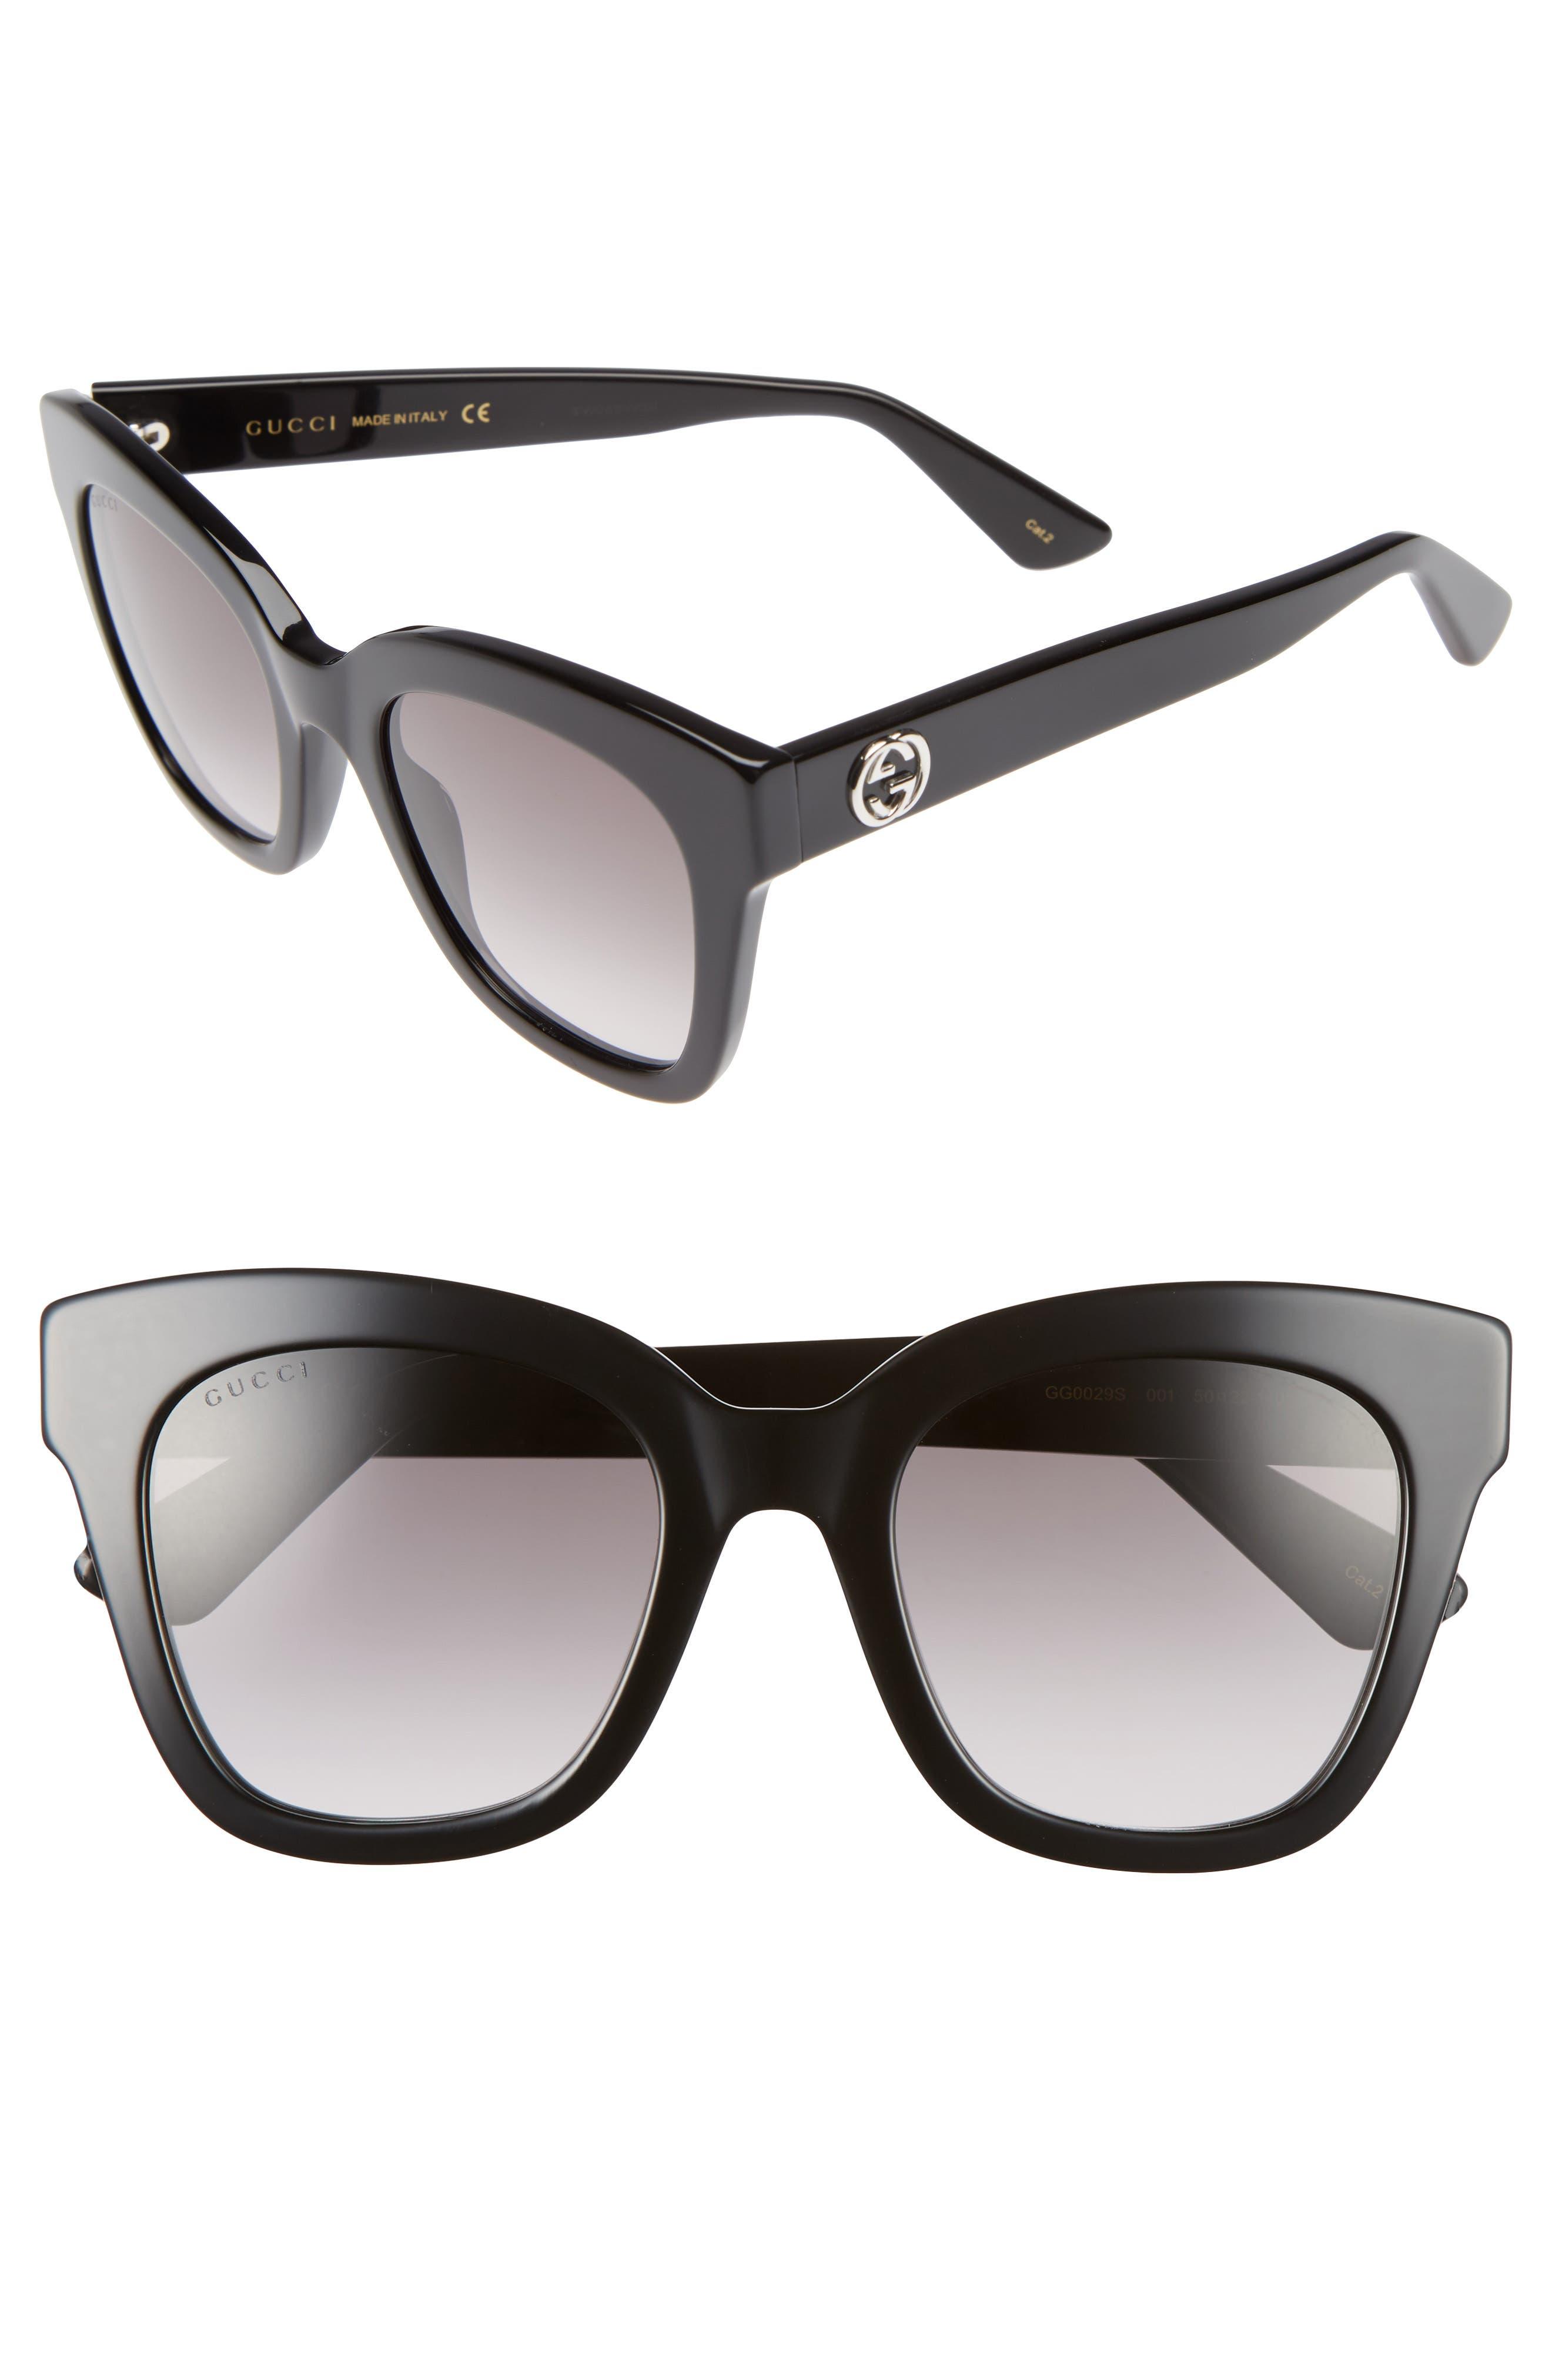 Main Image - Gucci 50mm Cat Eye Sunglasses